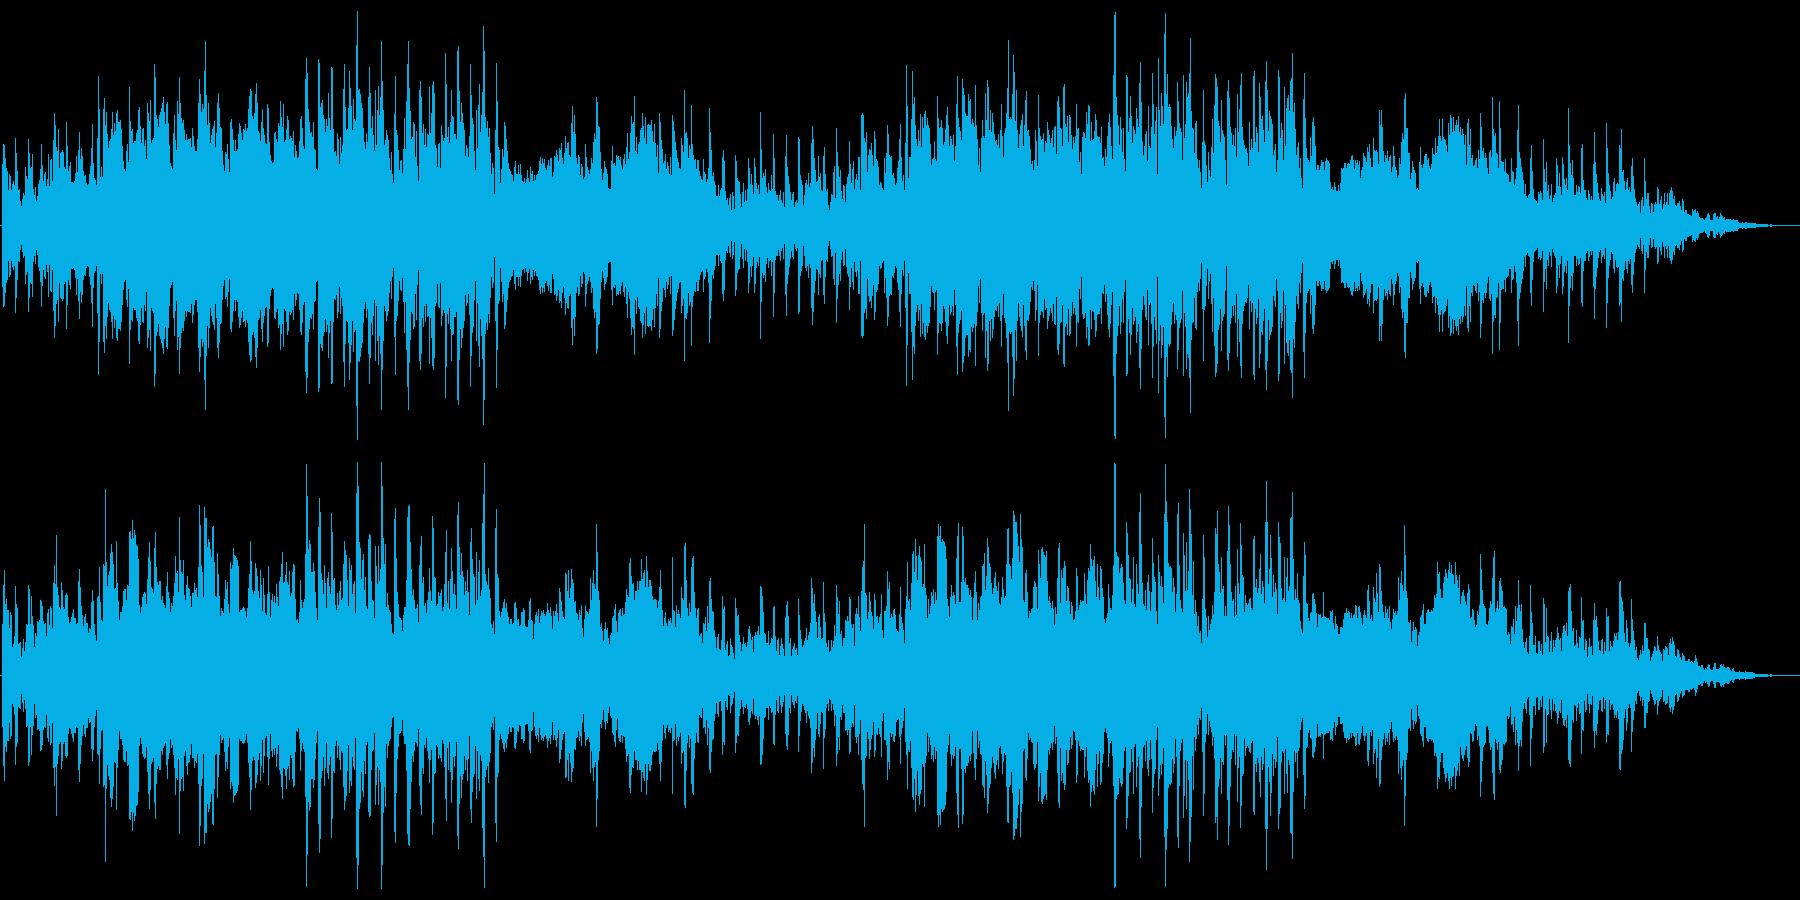 RPGフィールドBGM風オーケストラ曲2の再生済みの波形